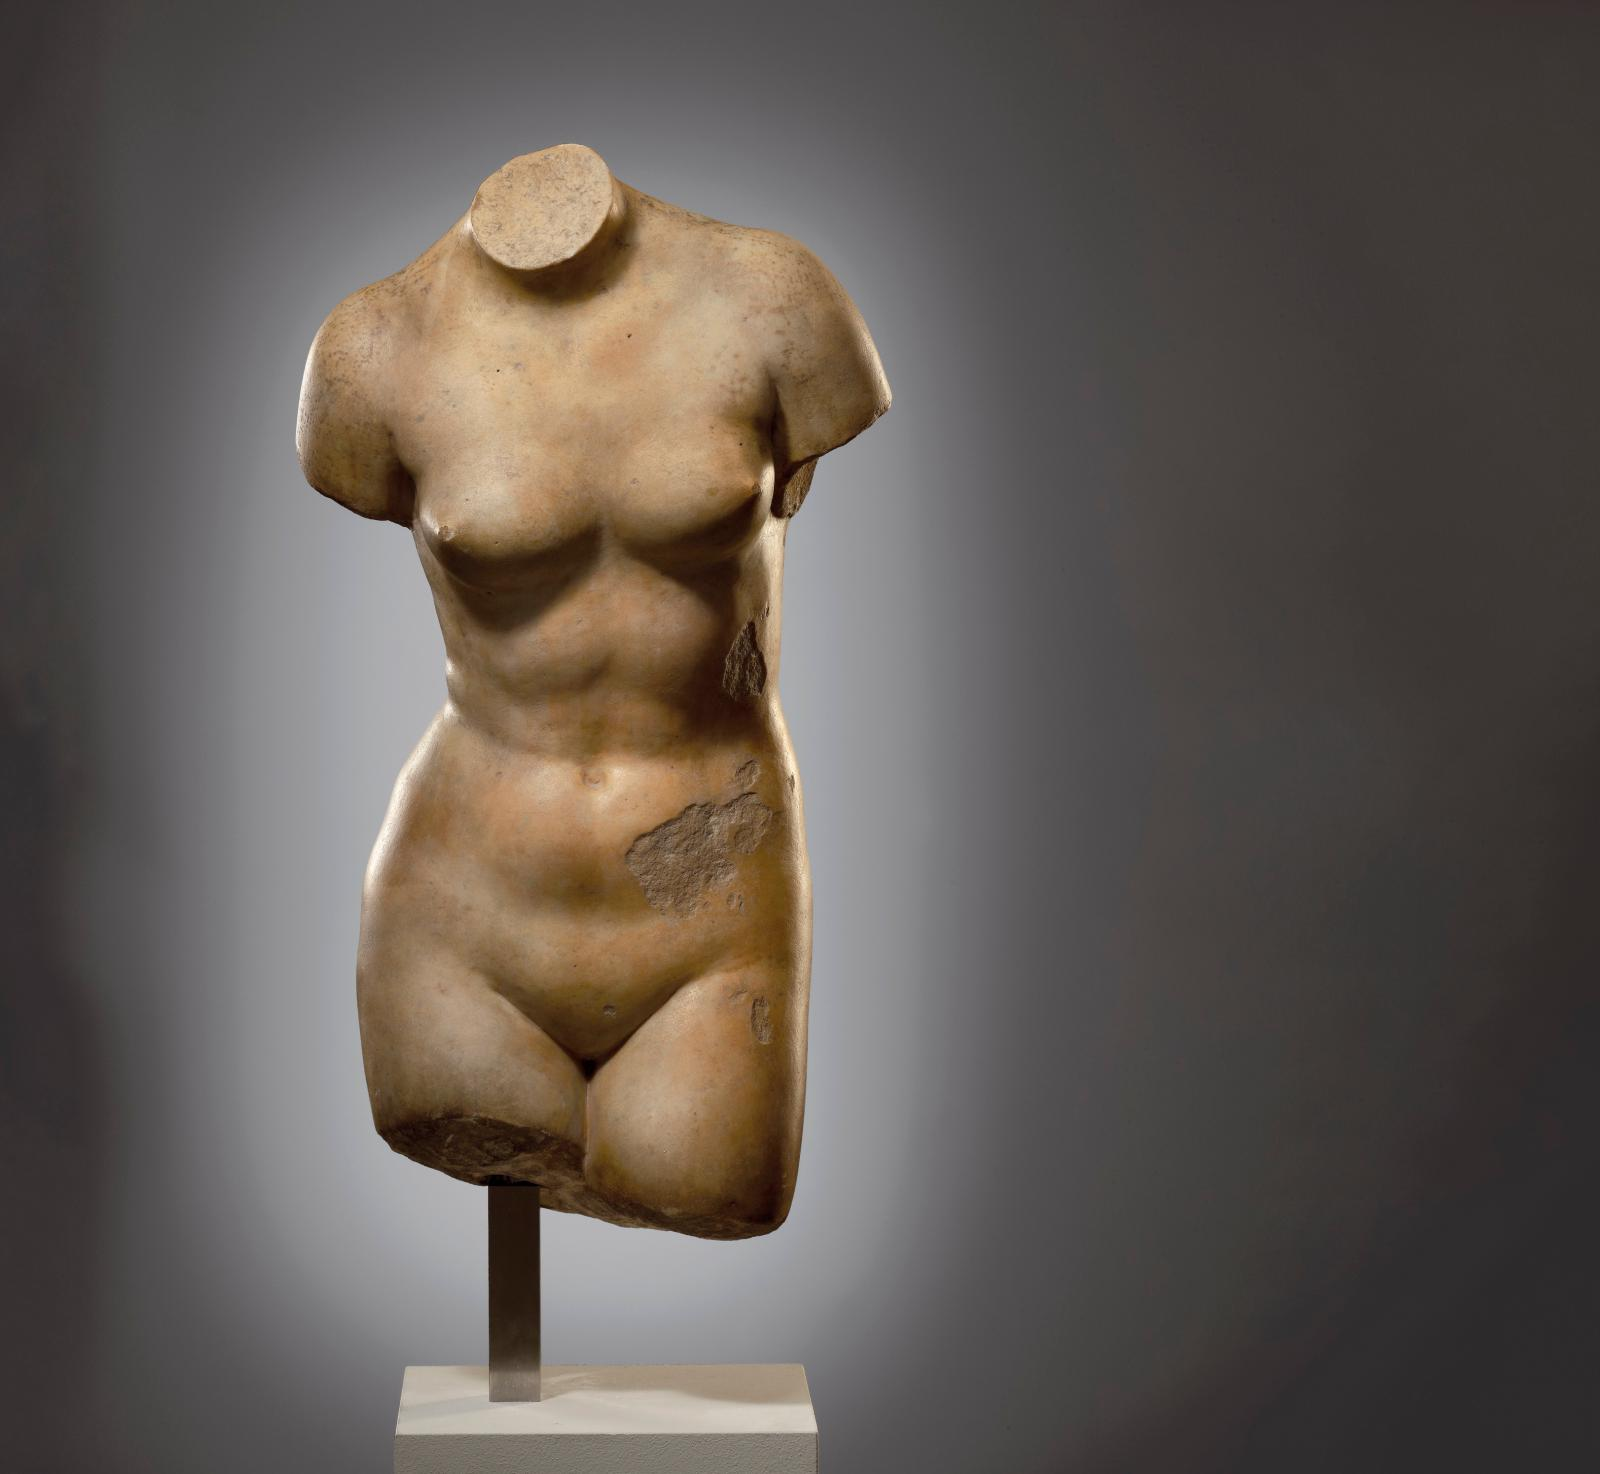 Nude torso of Aphrodite, 2nd - 1st century BC, marble, h. 50.5 cm.© Cahn International